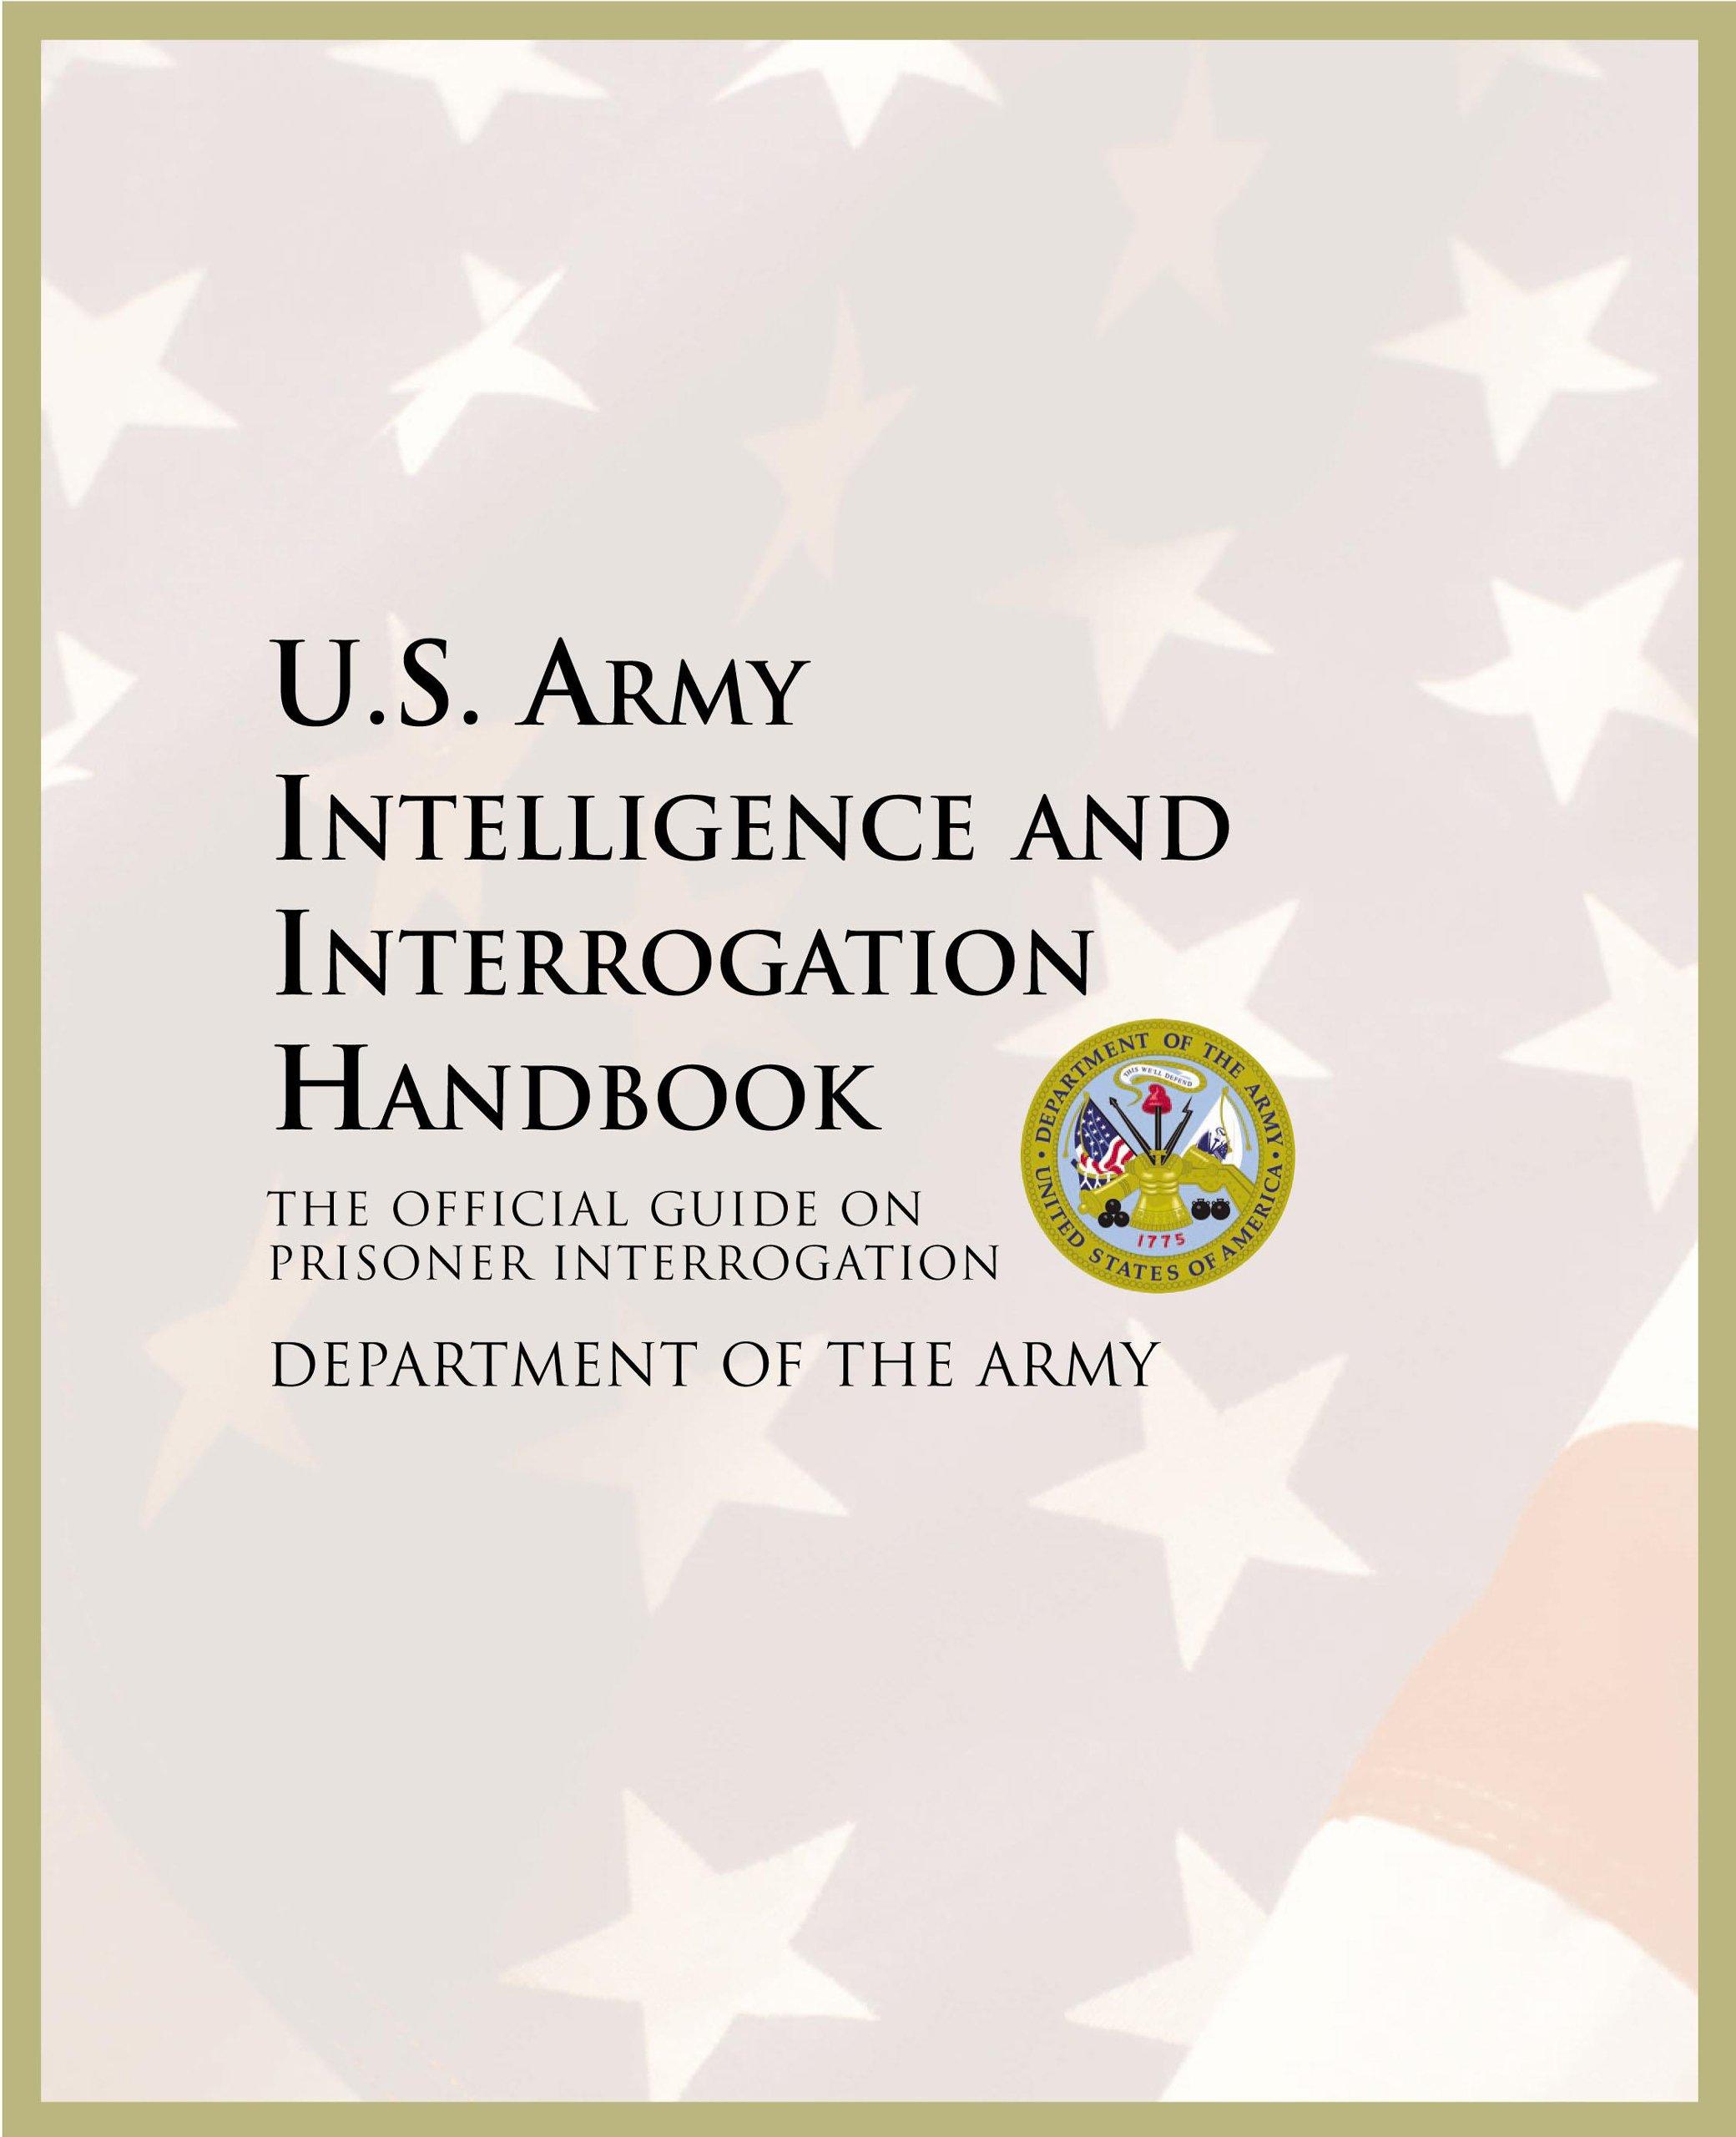 U.S. Army Intelligence and Interrogation Handbook: The Official Guide on Prisoner Interrogation